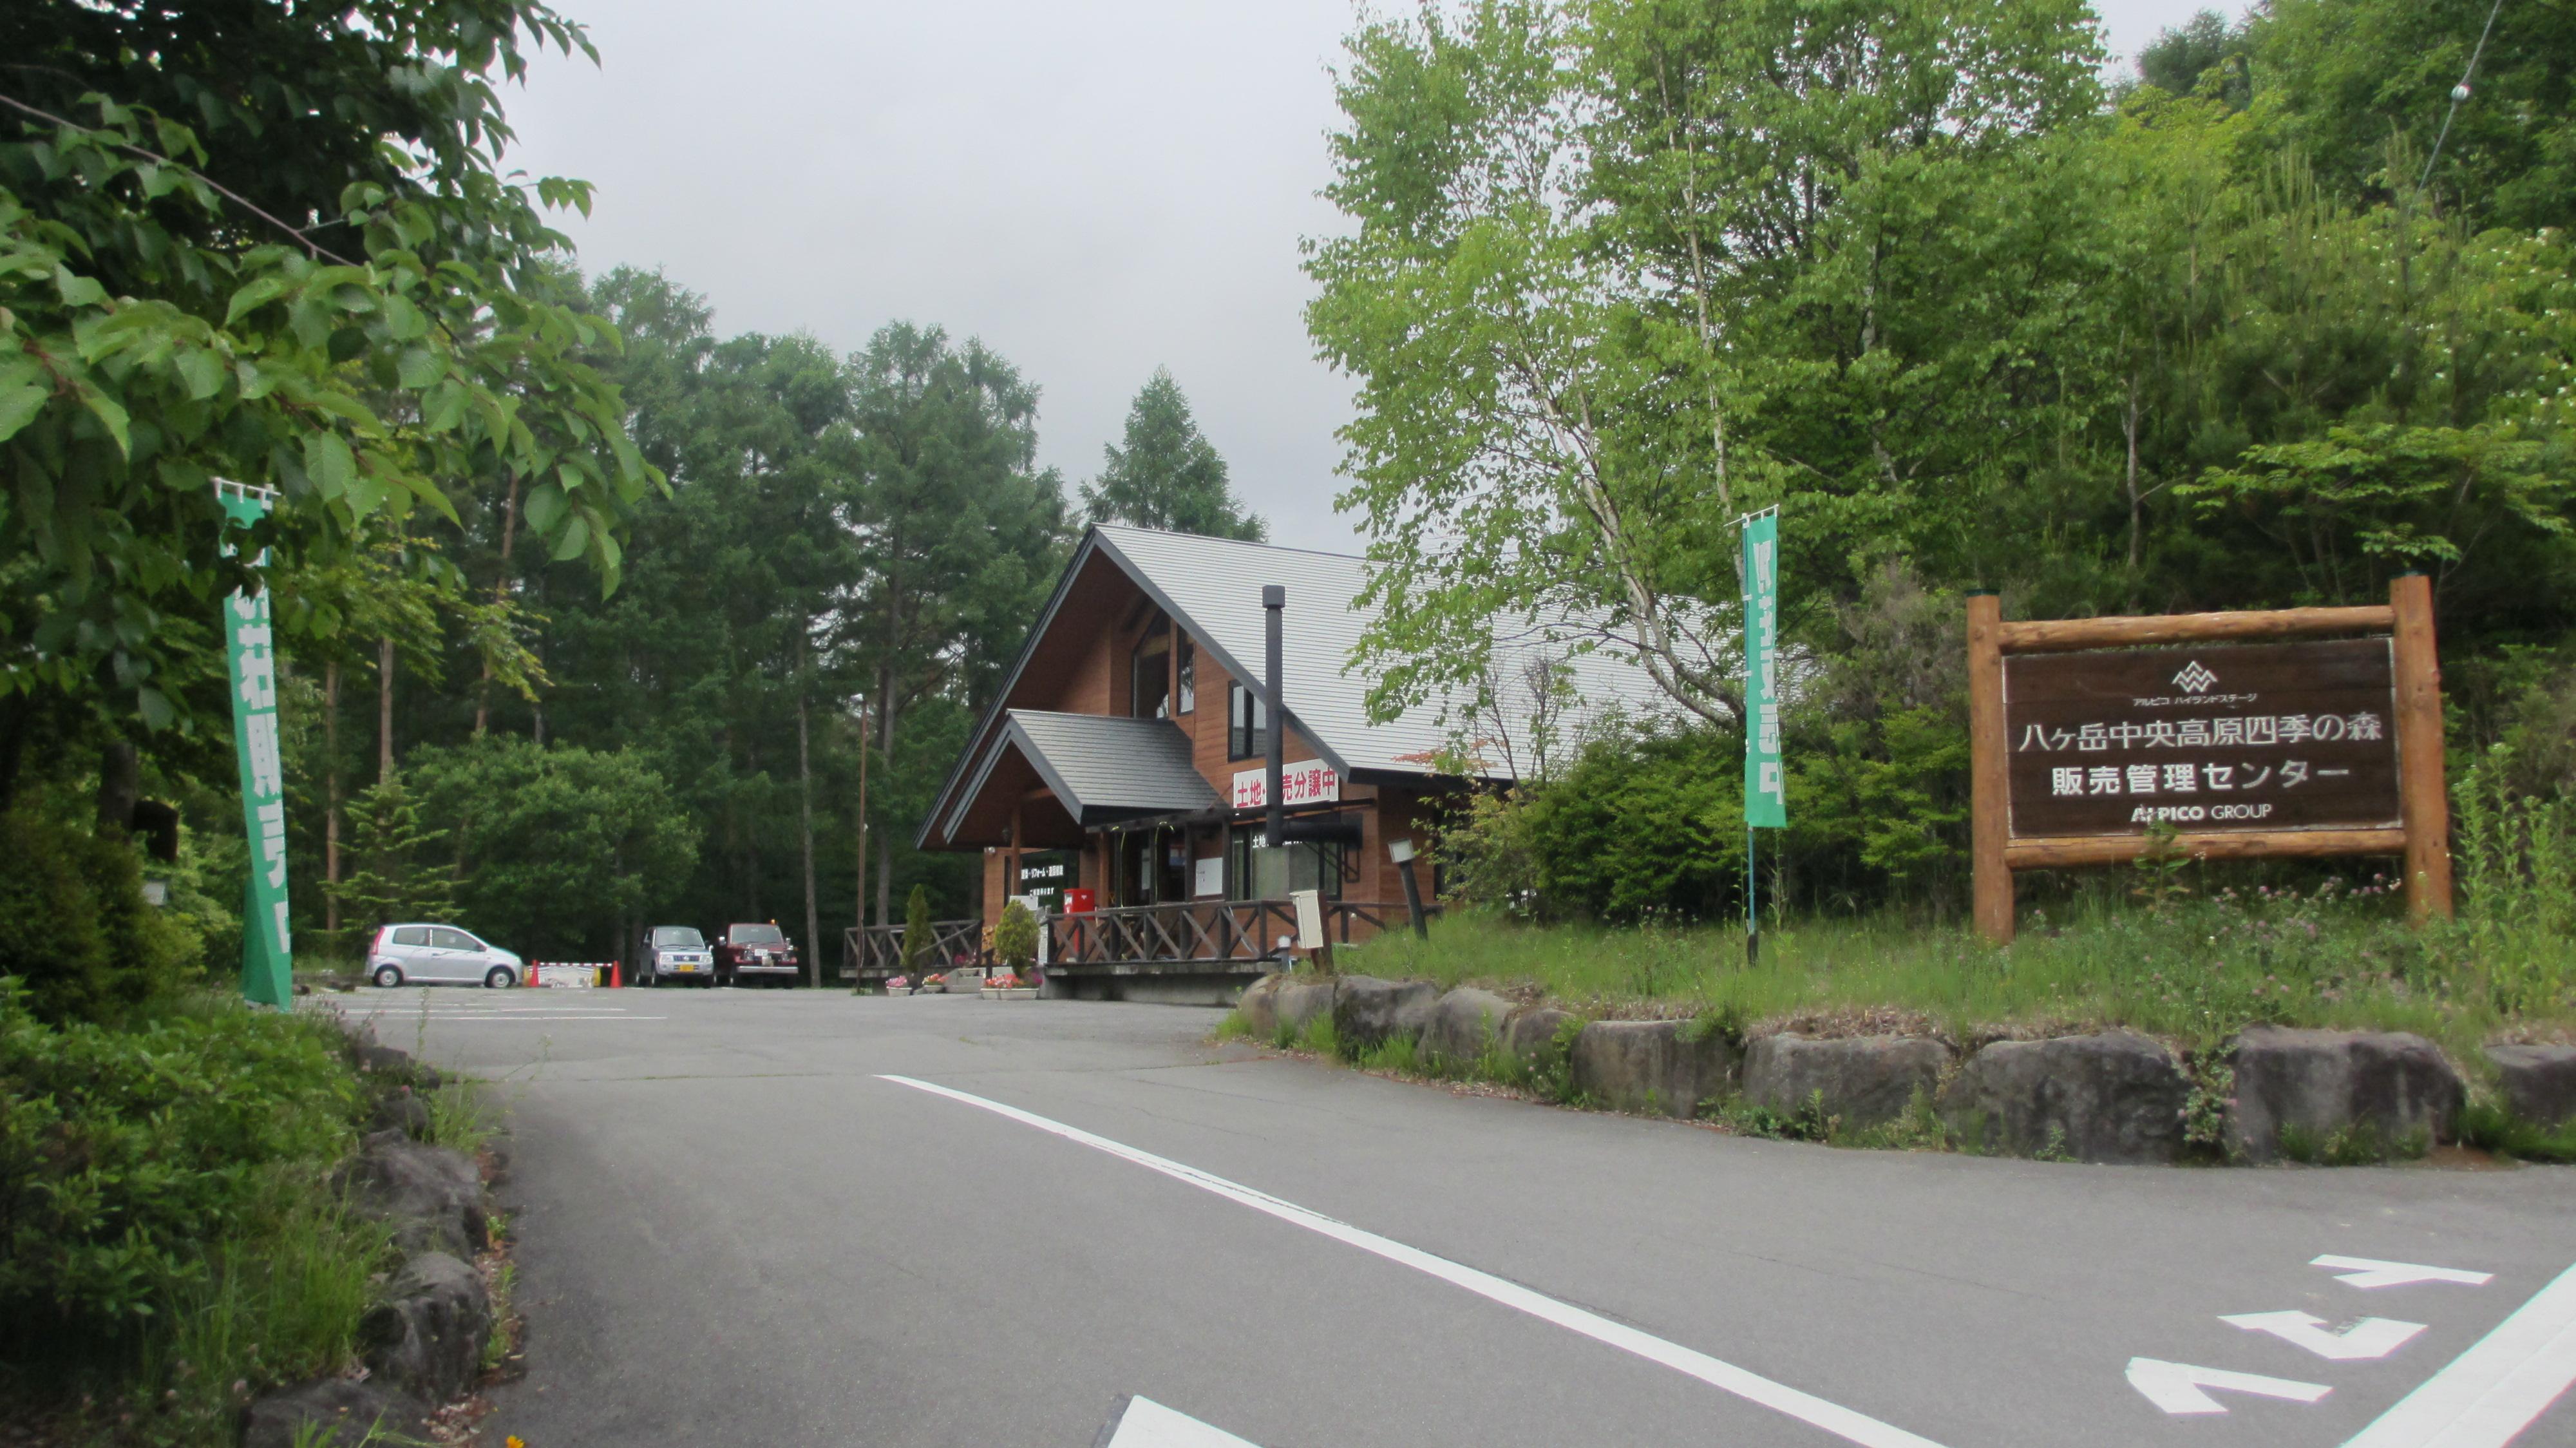 http://www.alpico.co.jp/shikinomori/news/images/IMG_8062.JPG